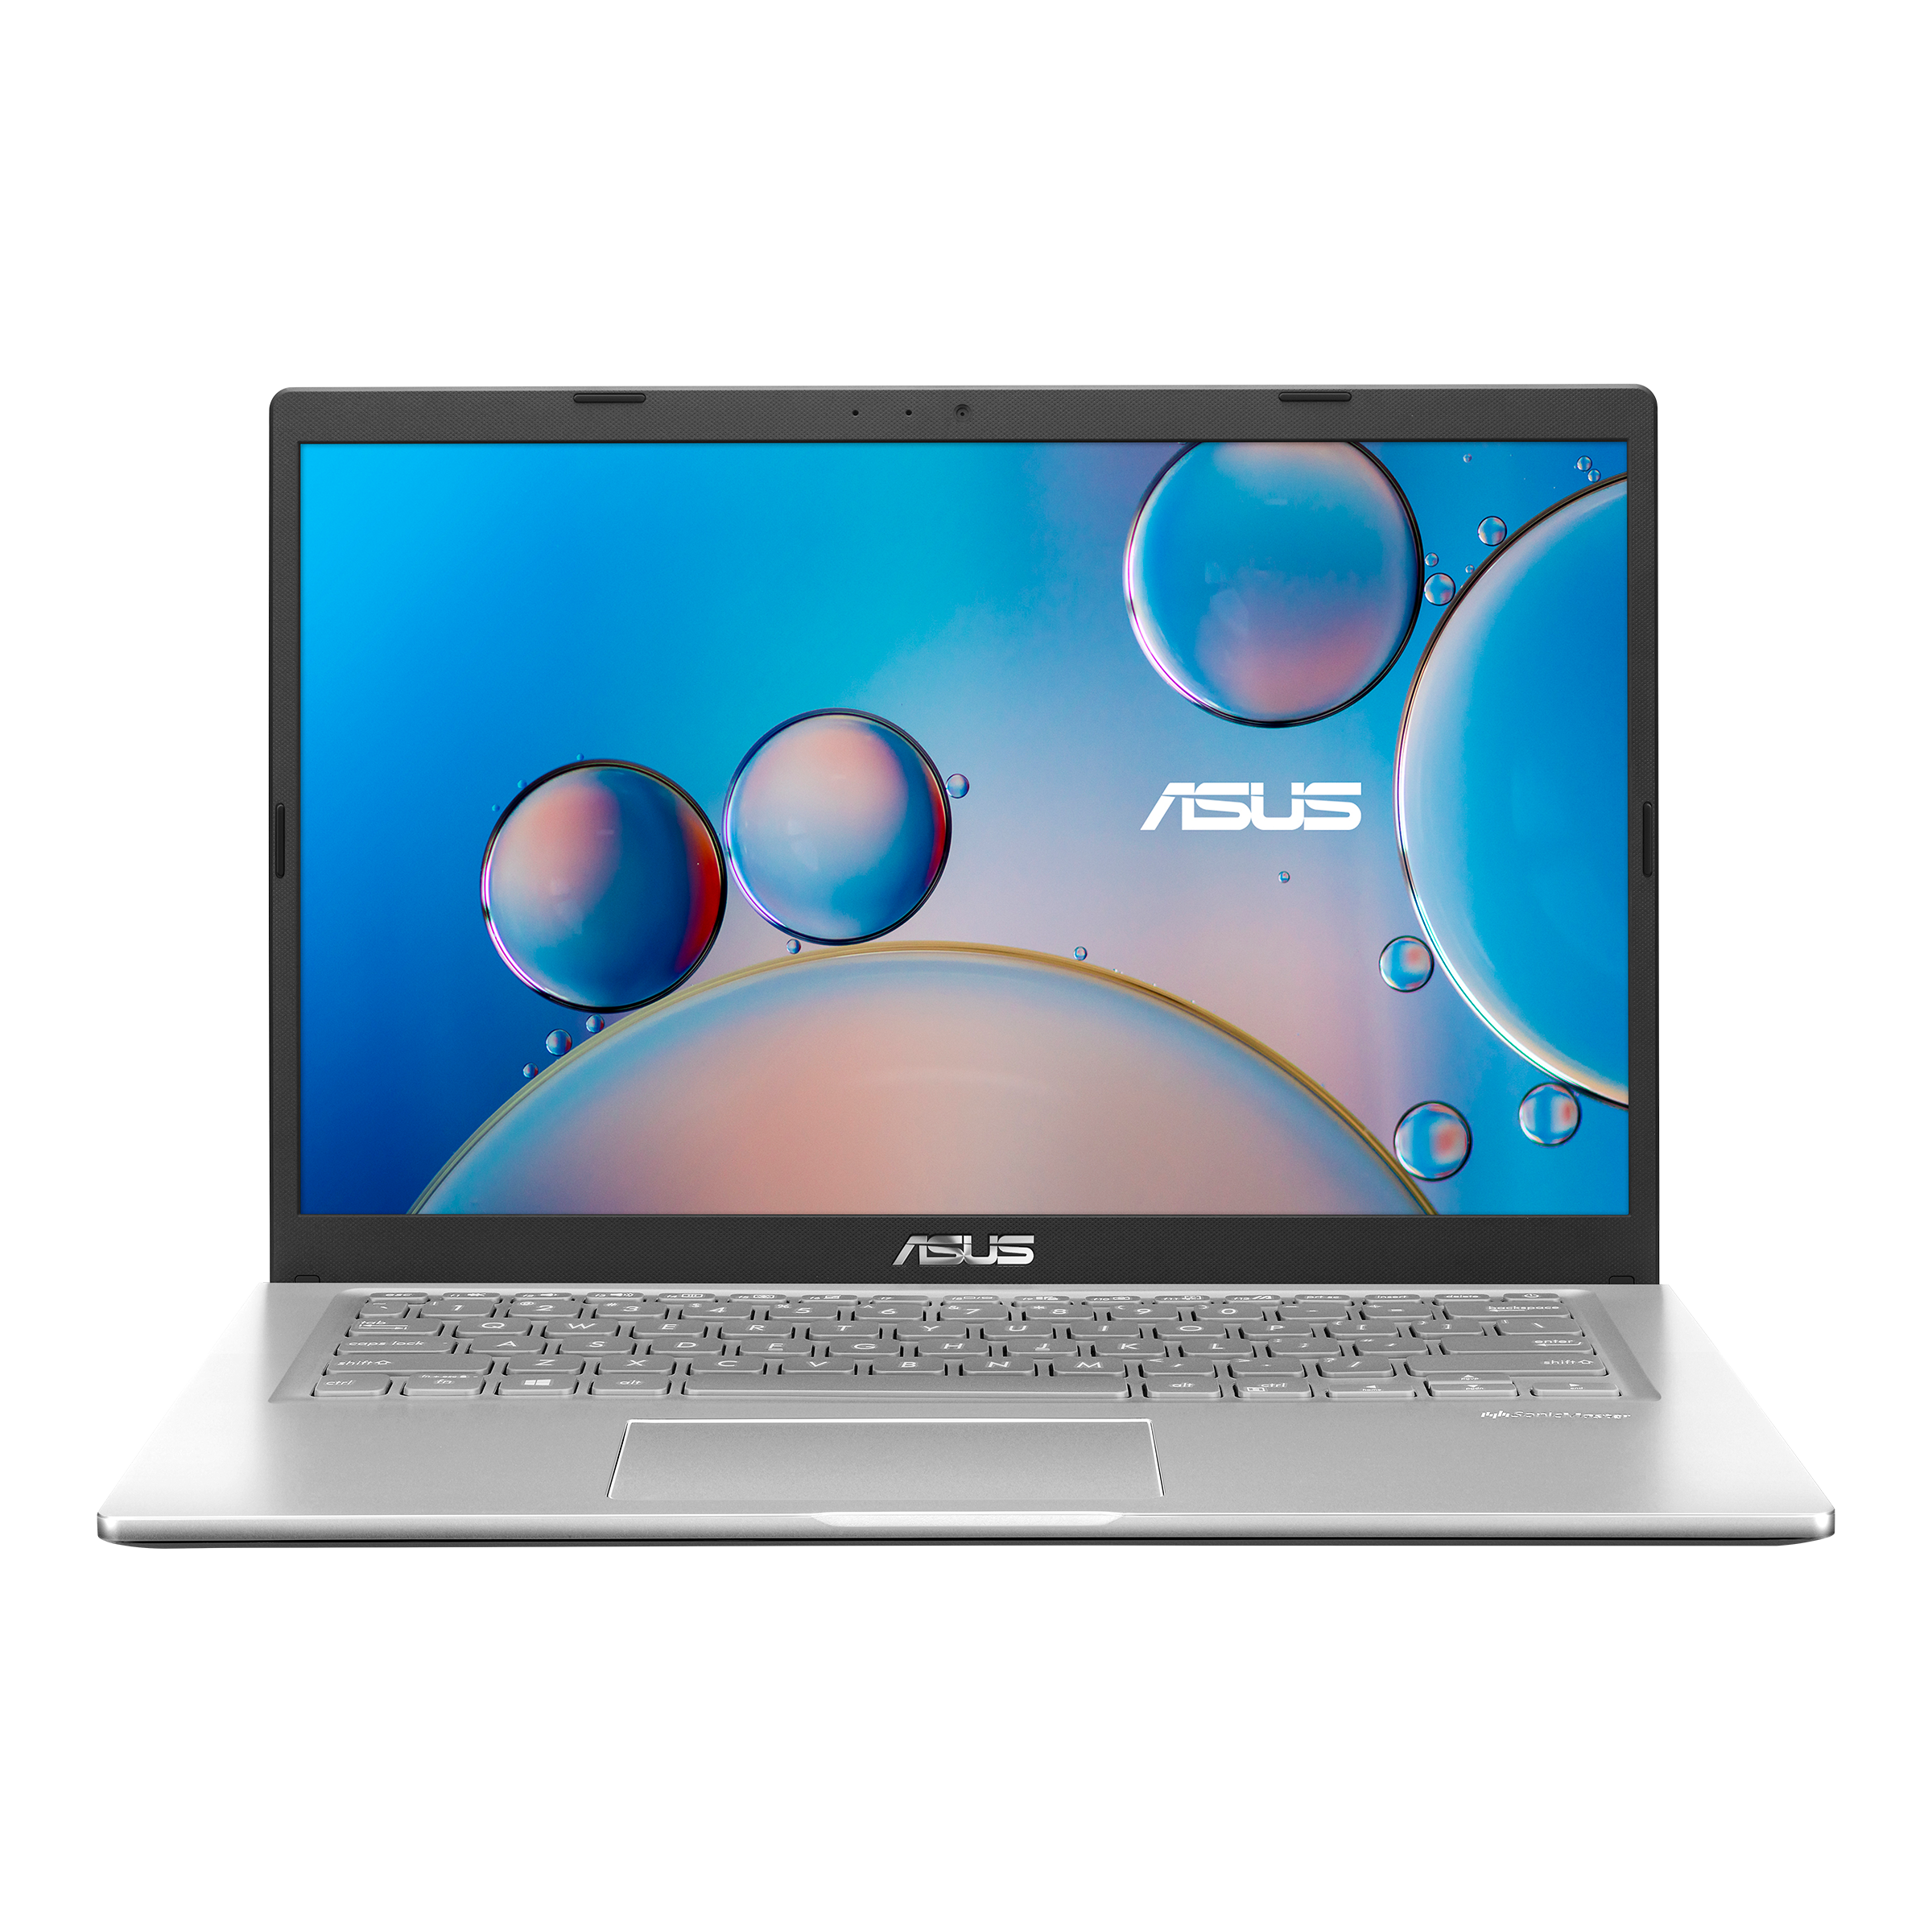 ASUS X415 (11th Gen Intel)